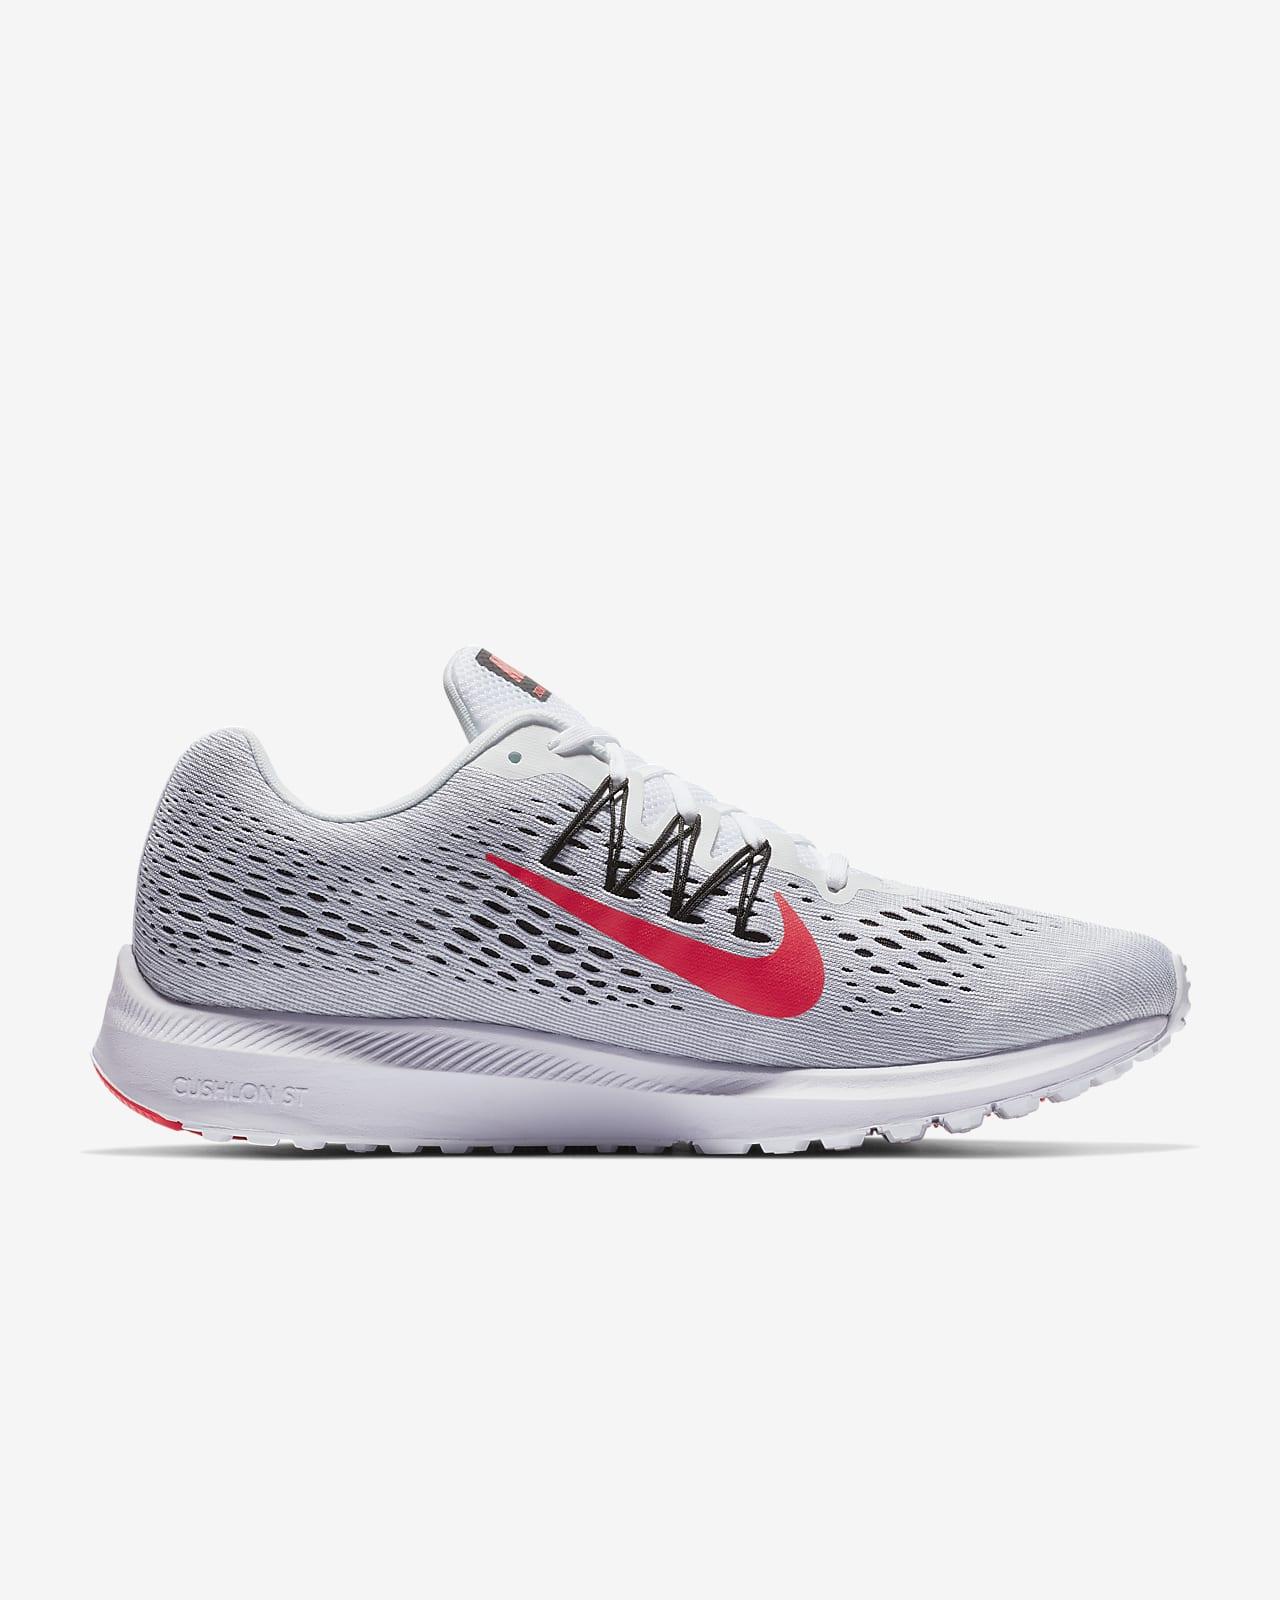 Cromático bobina Esquivo  Nike Air Zoom Winflo 5 Men's Running Shoe. Nike MY